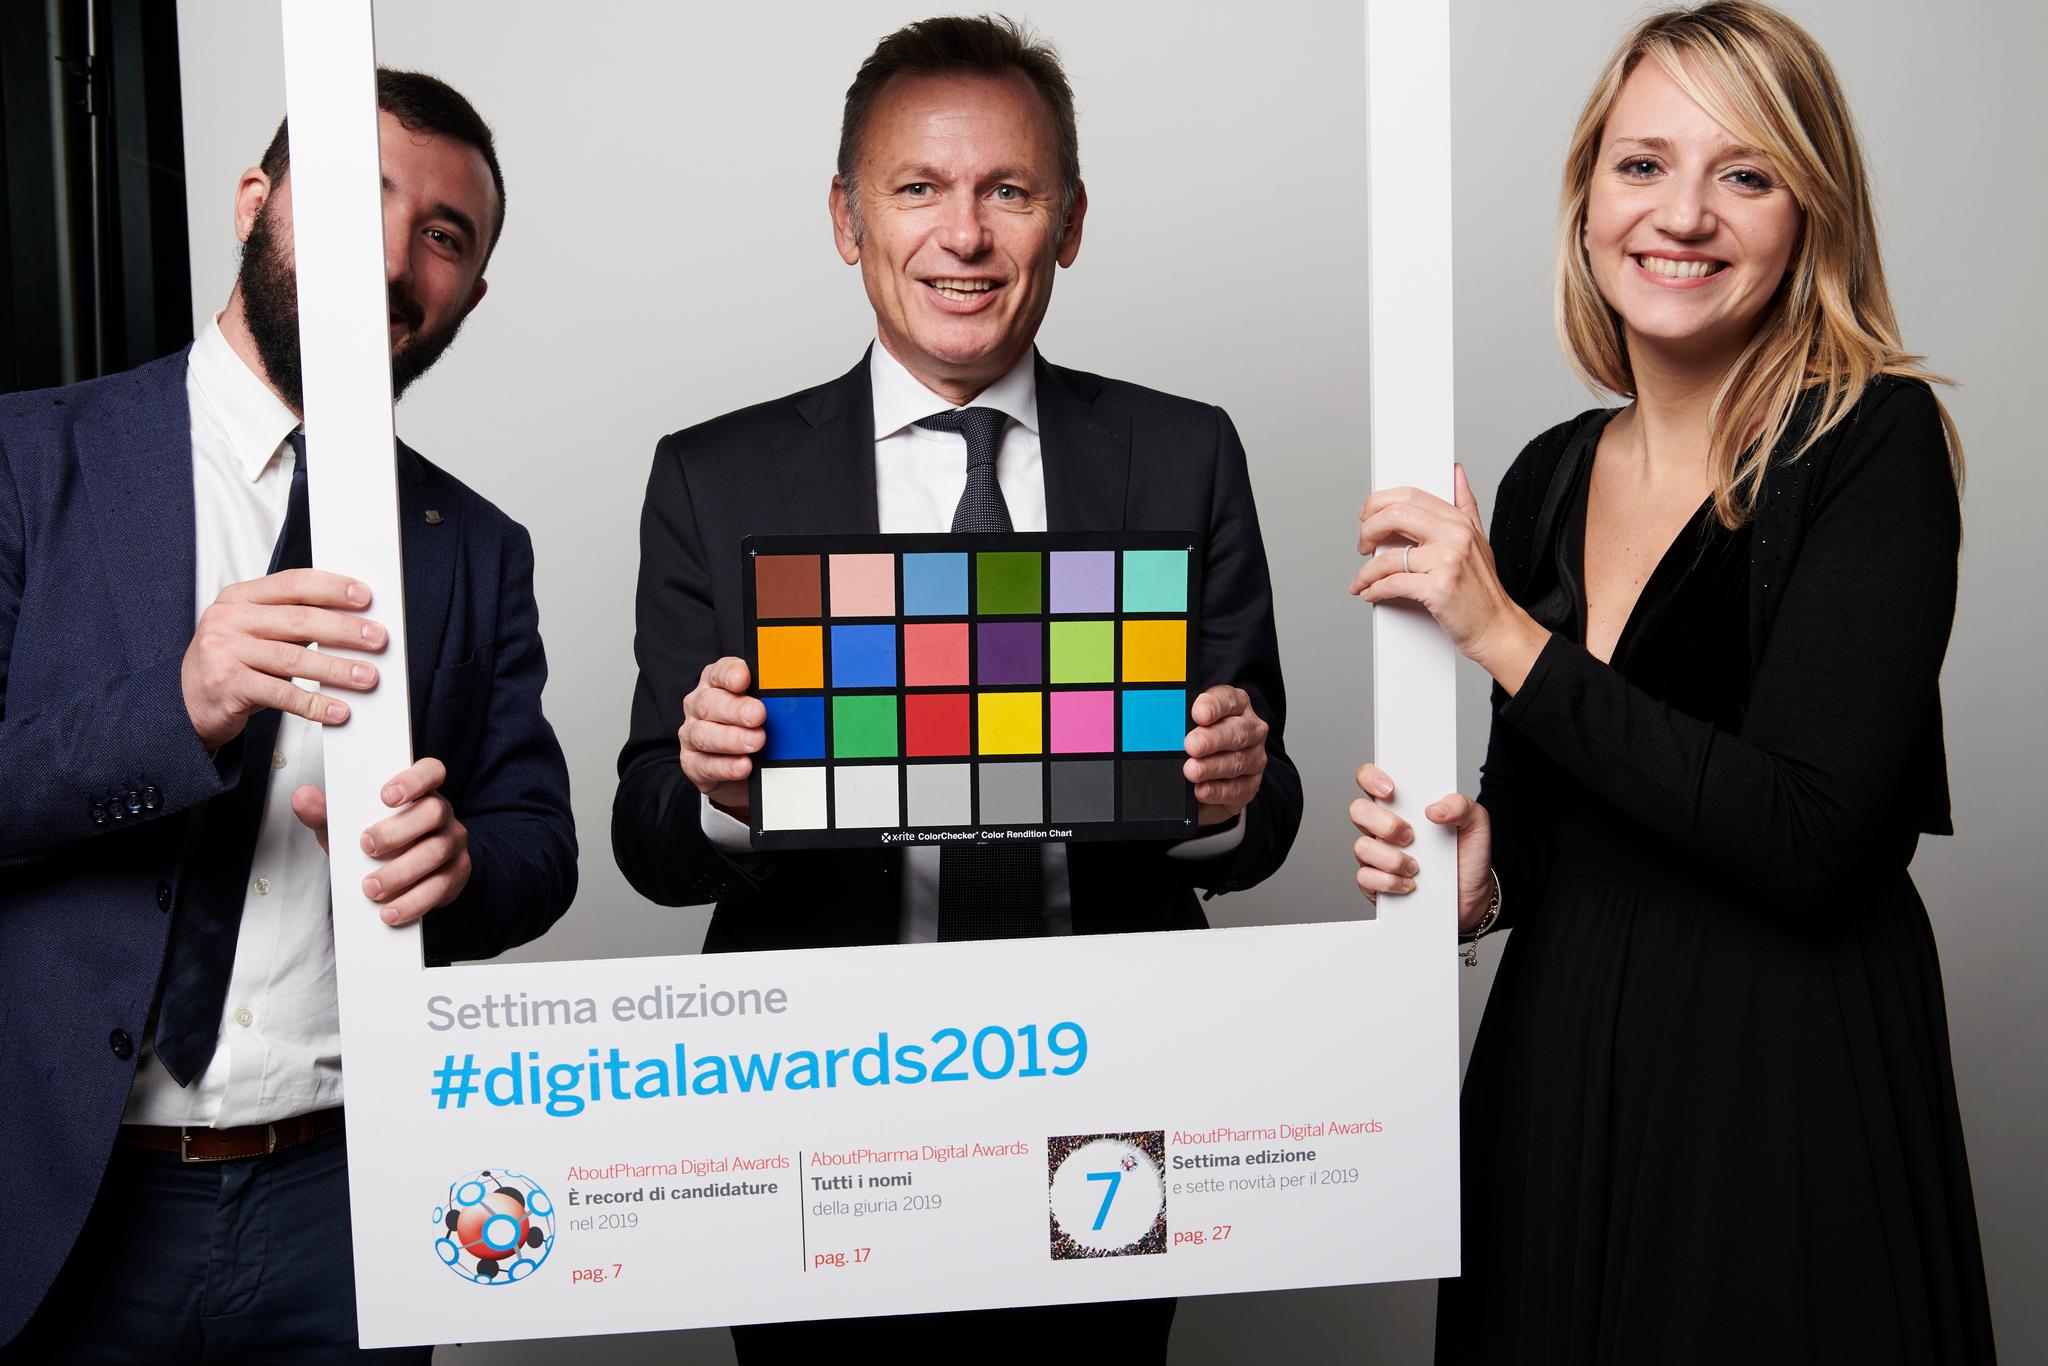 Photobooth AboutPharma Digital Awards 2019_55